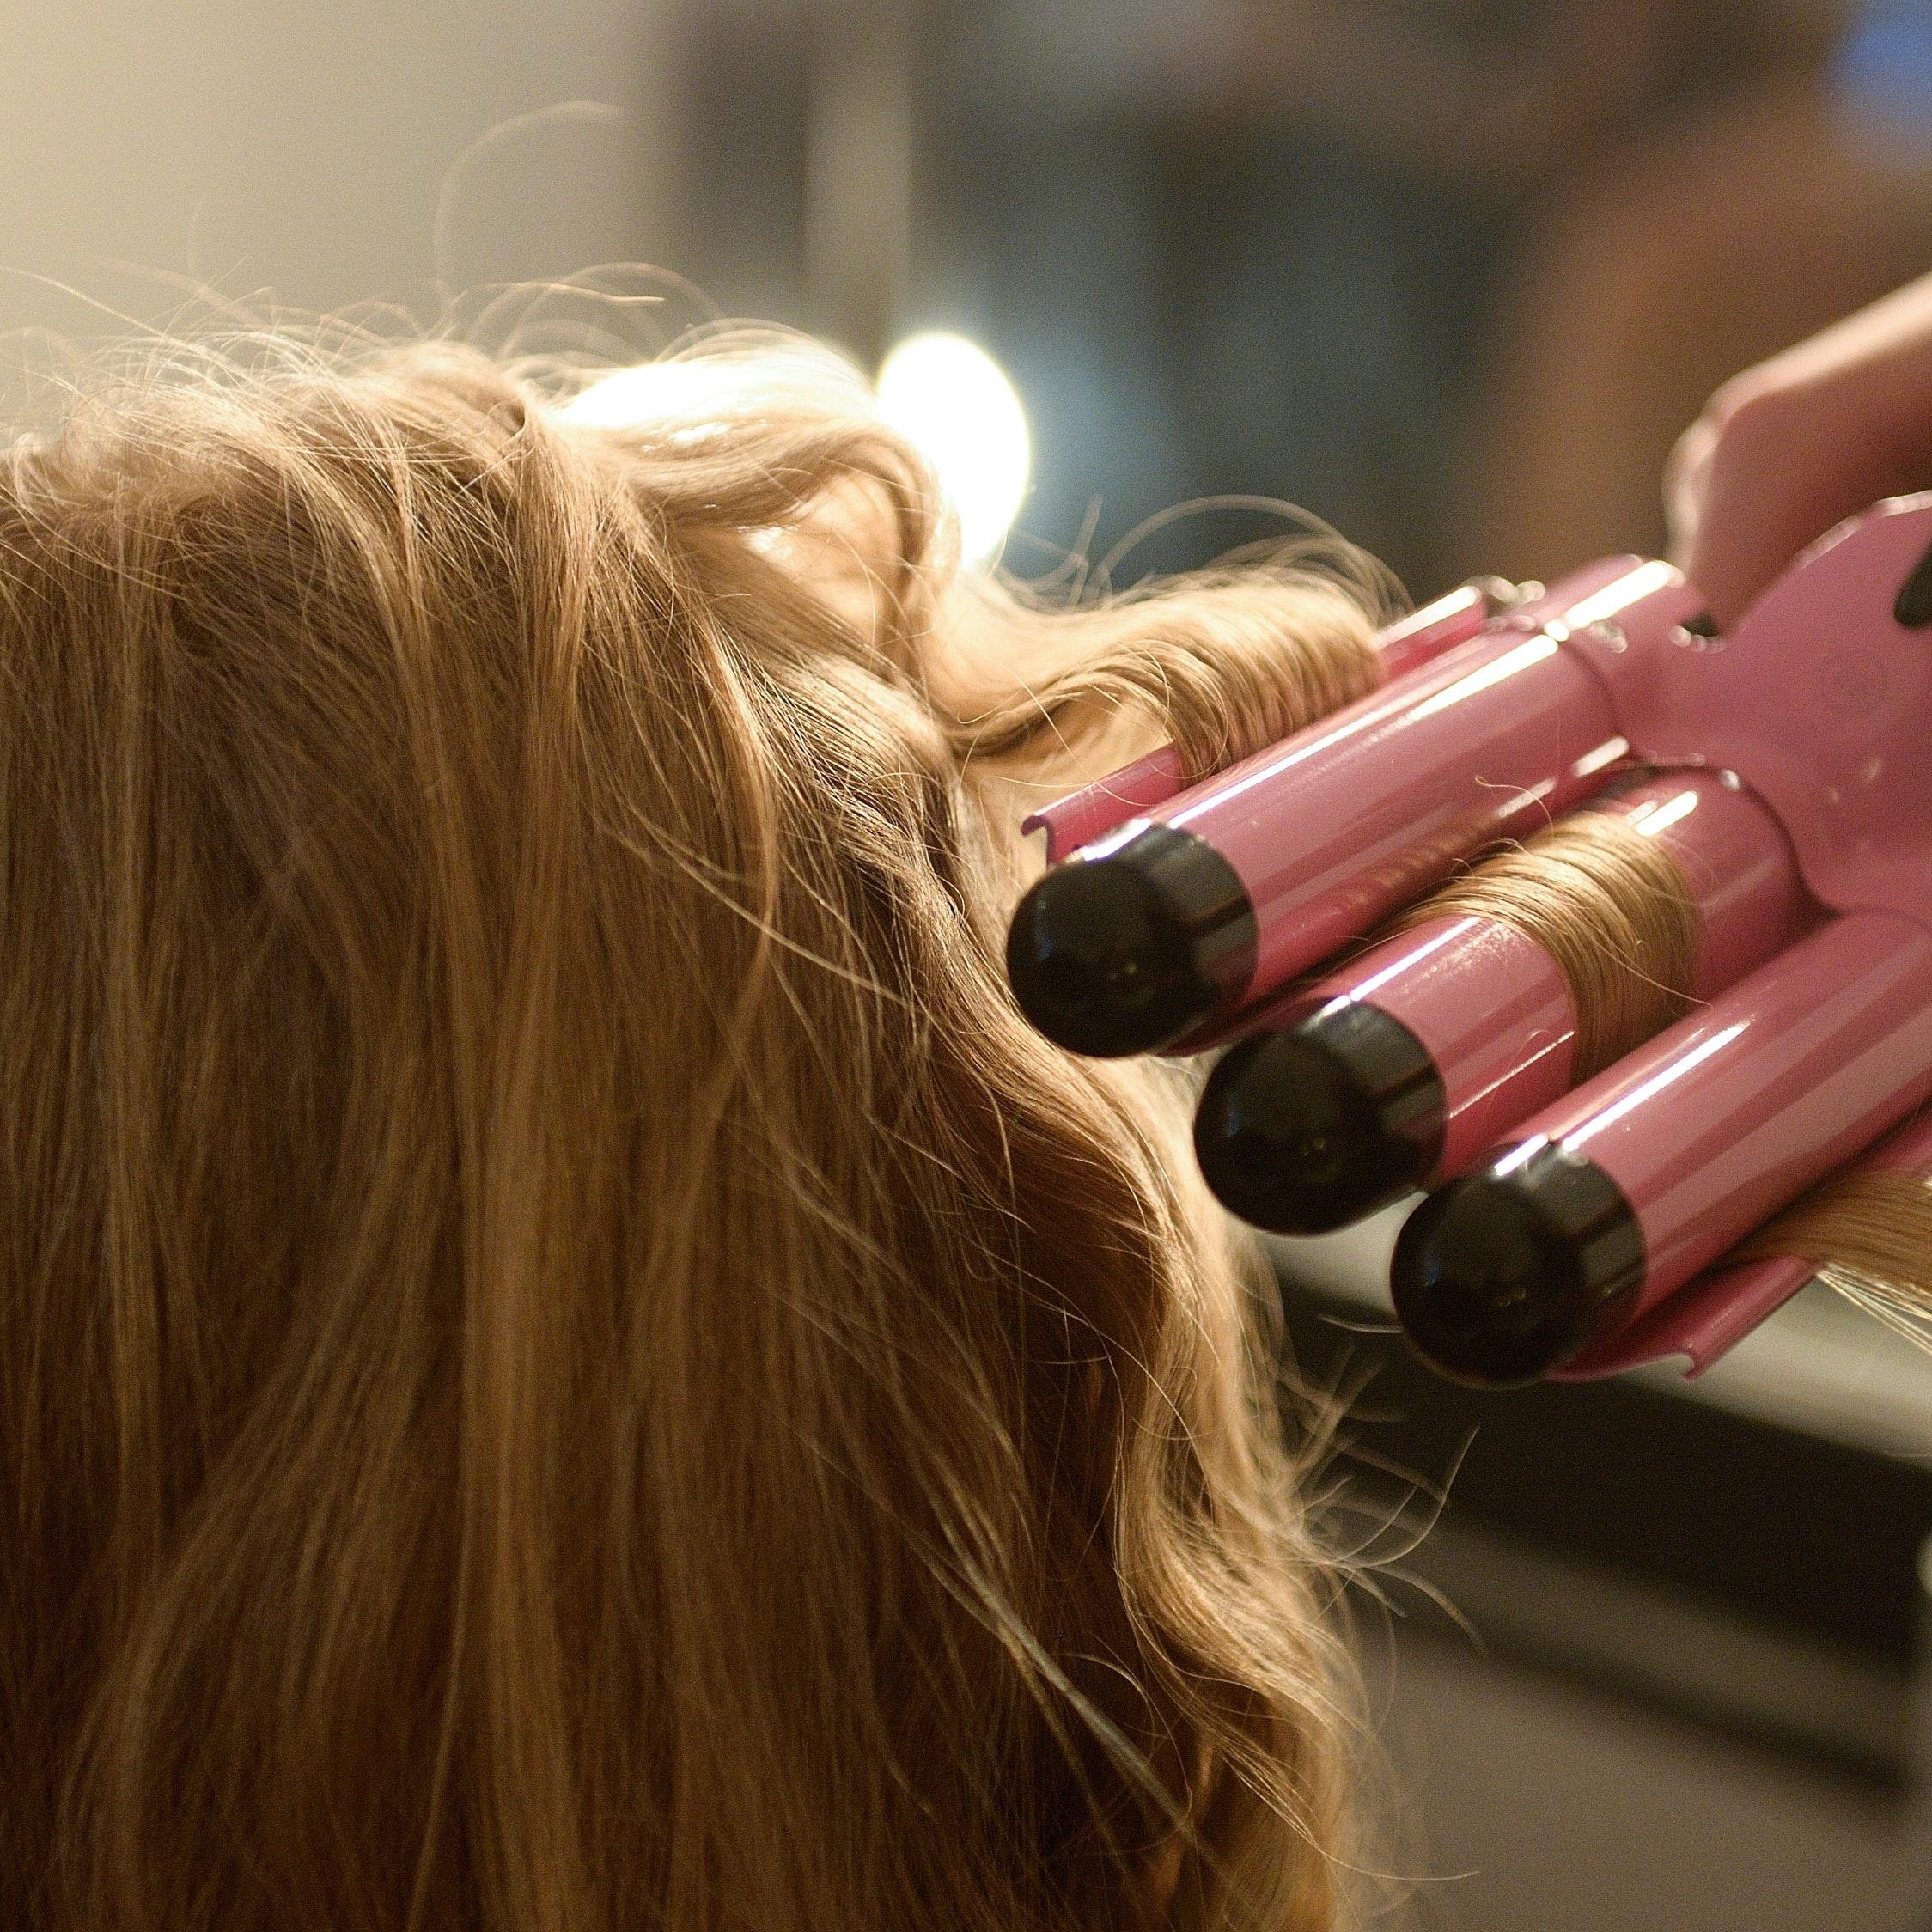 Denne hårtrend hitter